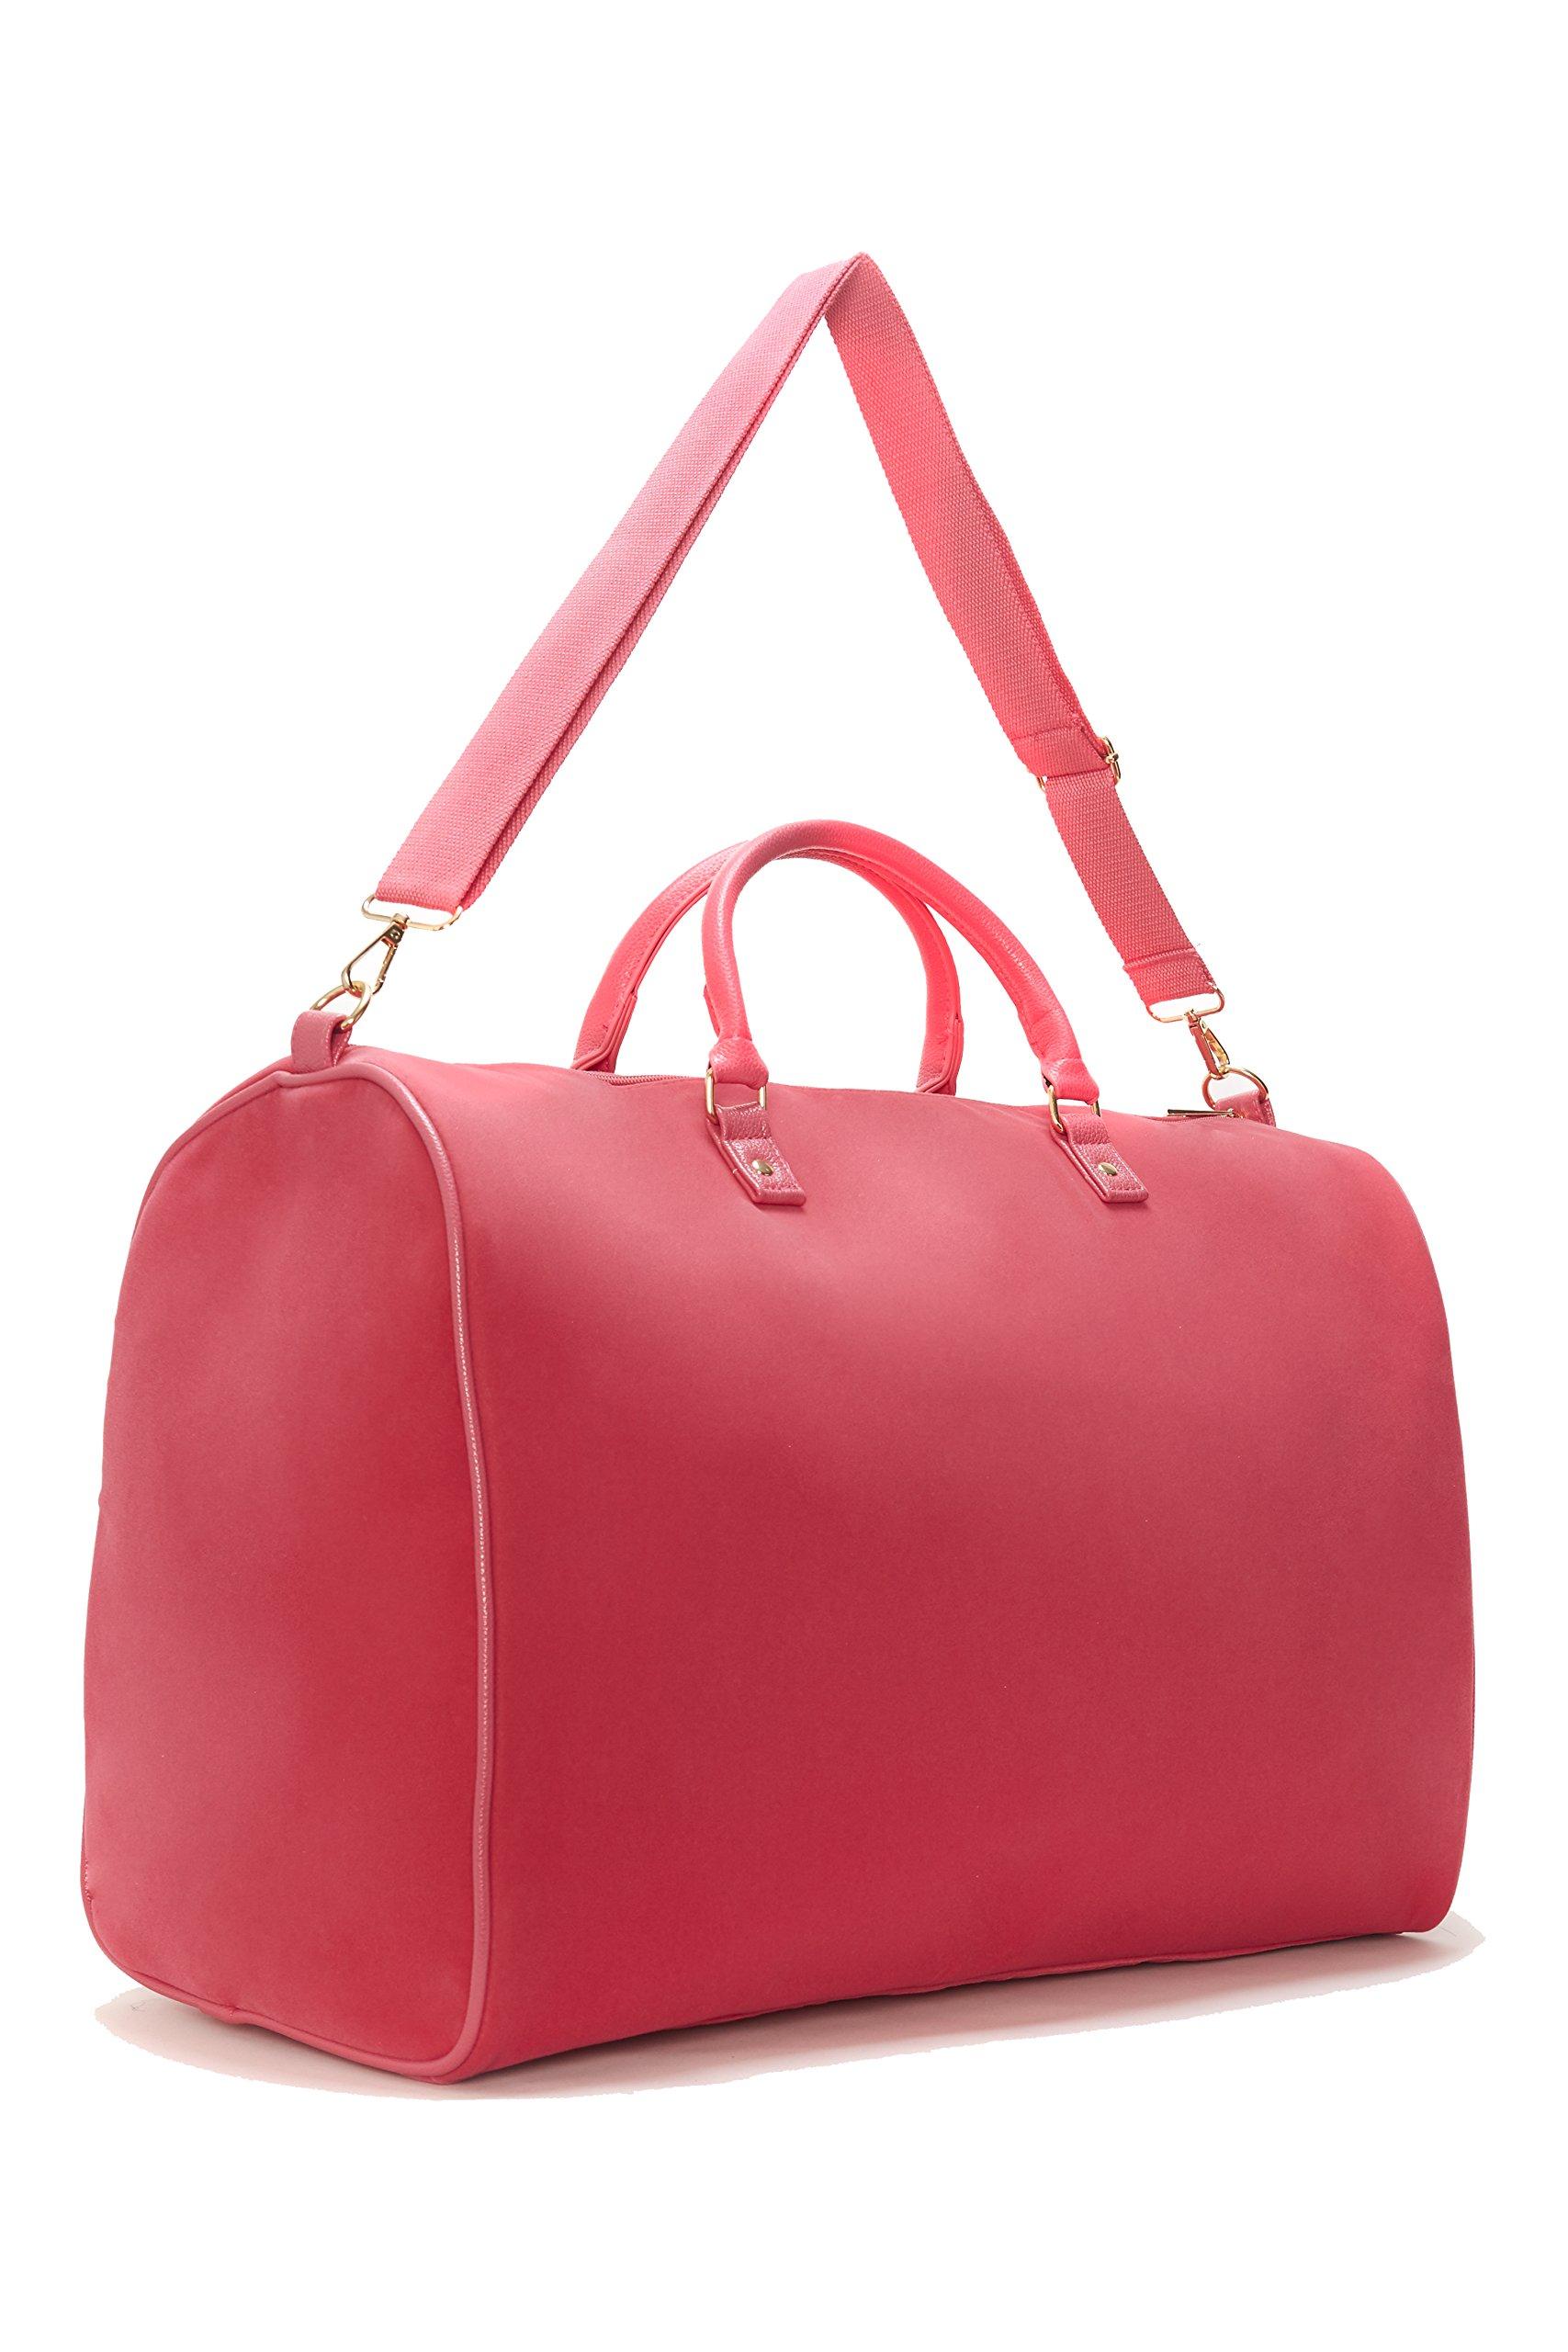 Limited Time Sale - Women's Fuchsia Velvet Weekender Bag, Duffle Bag, Overnight Bag, Travel Bag, Luggage (Fuchsia) MSRP $99